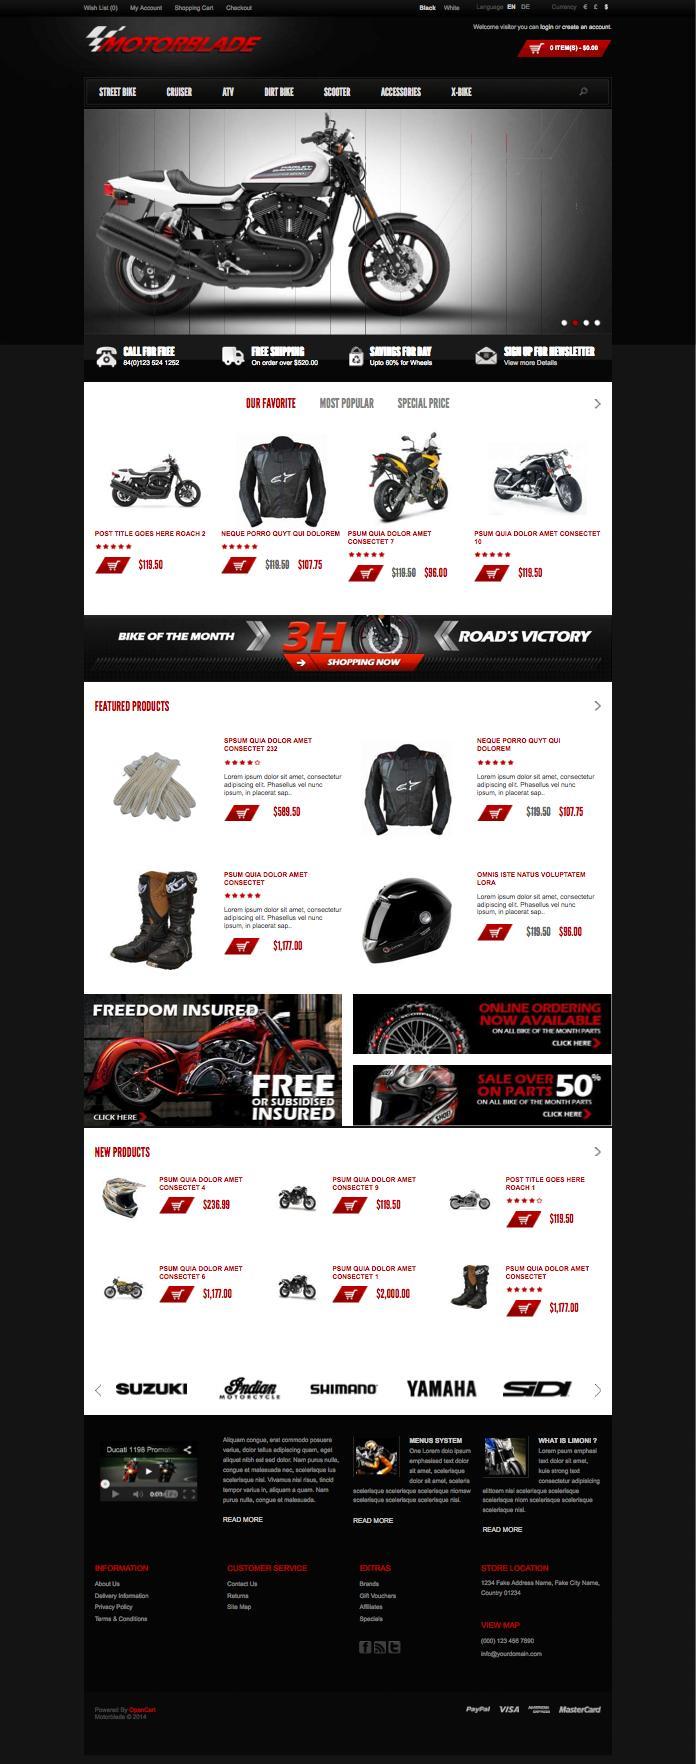 Motorblade Motorbike Accessories OpenCart Theme